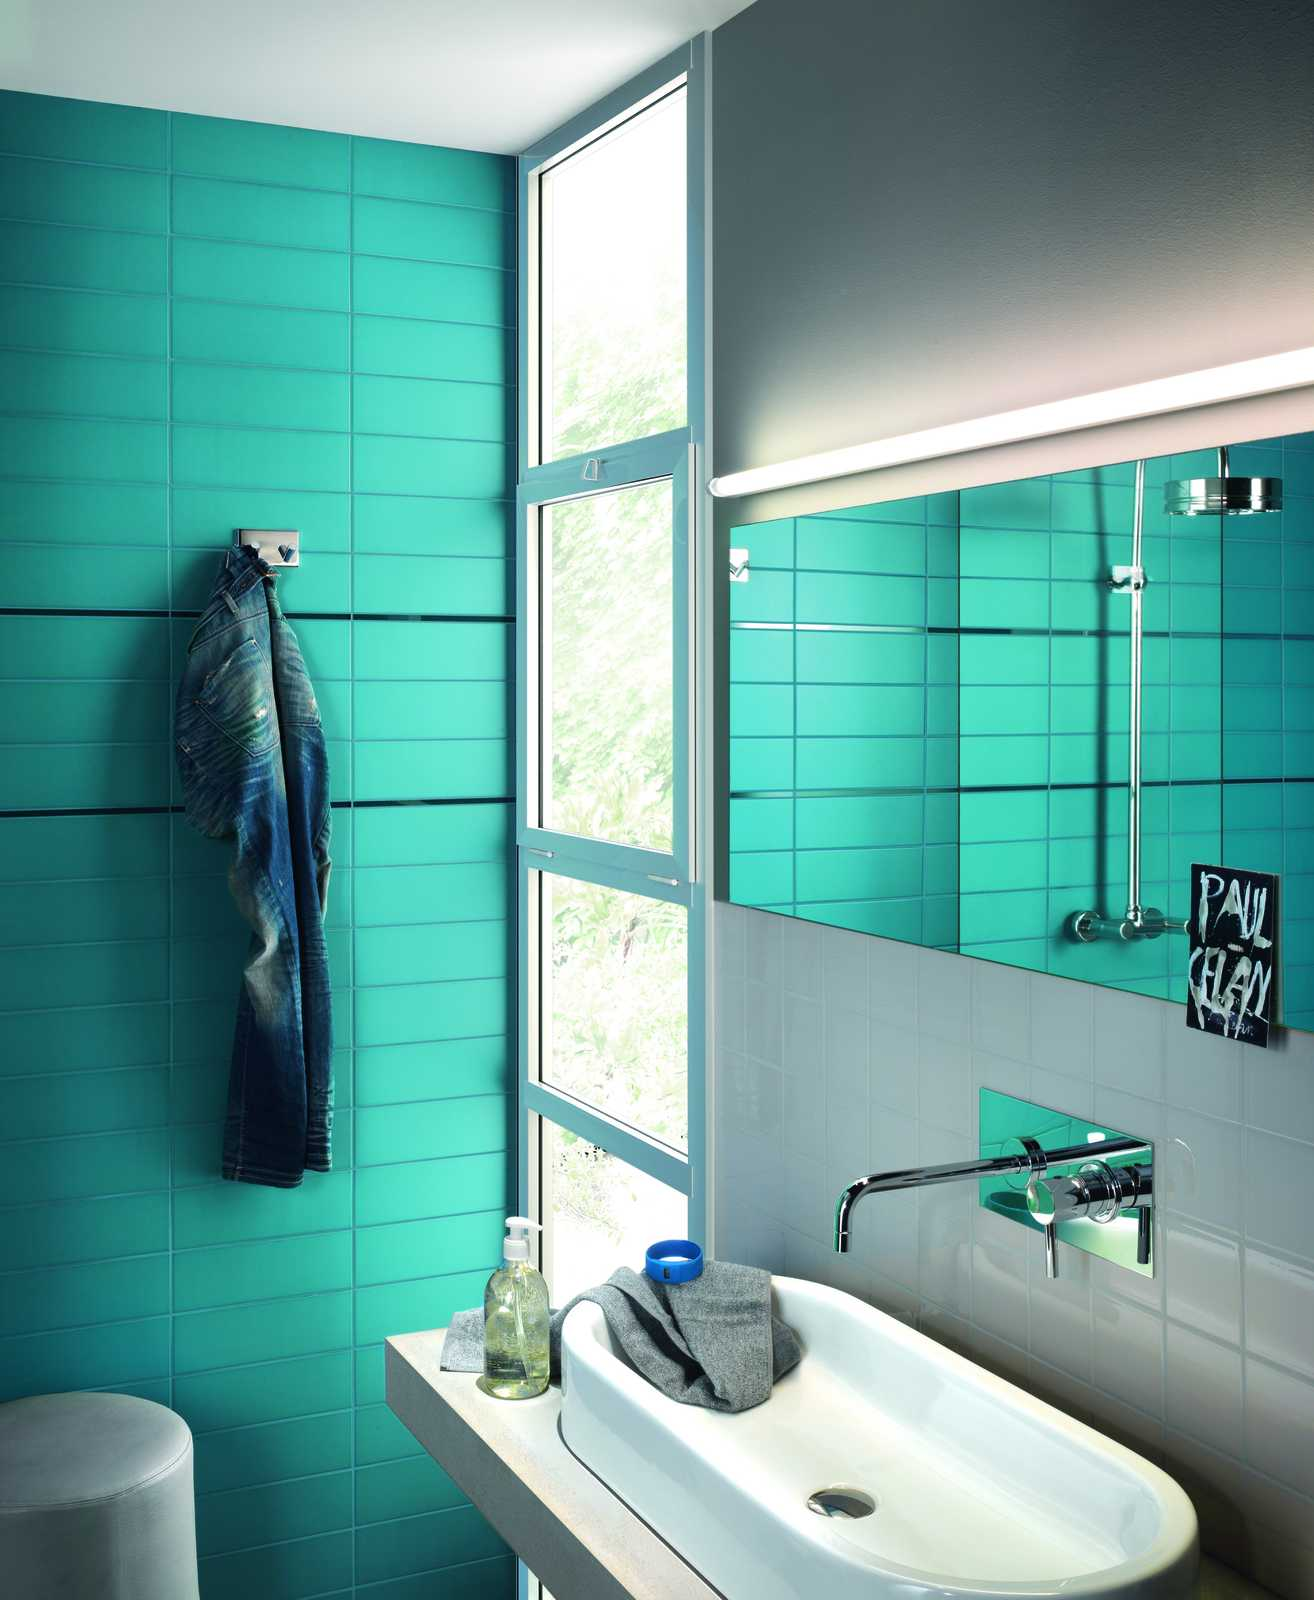 Unitech collection ceramic tiles pure colour ragno - Piastrelle 10x10 bagno ...